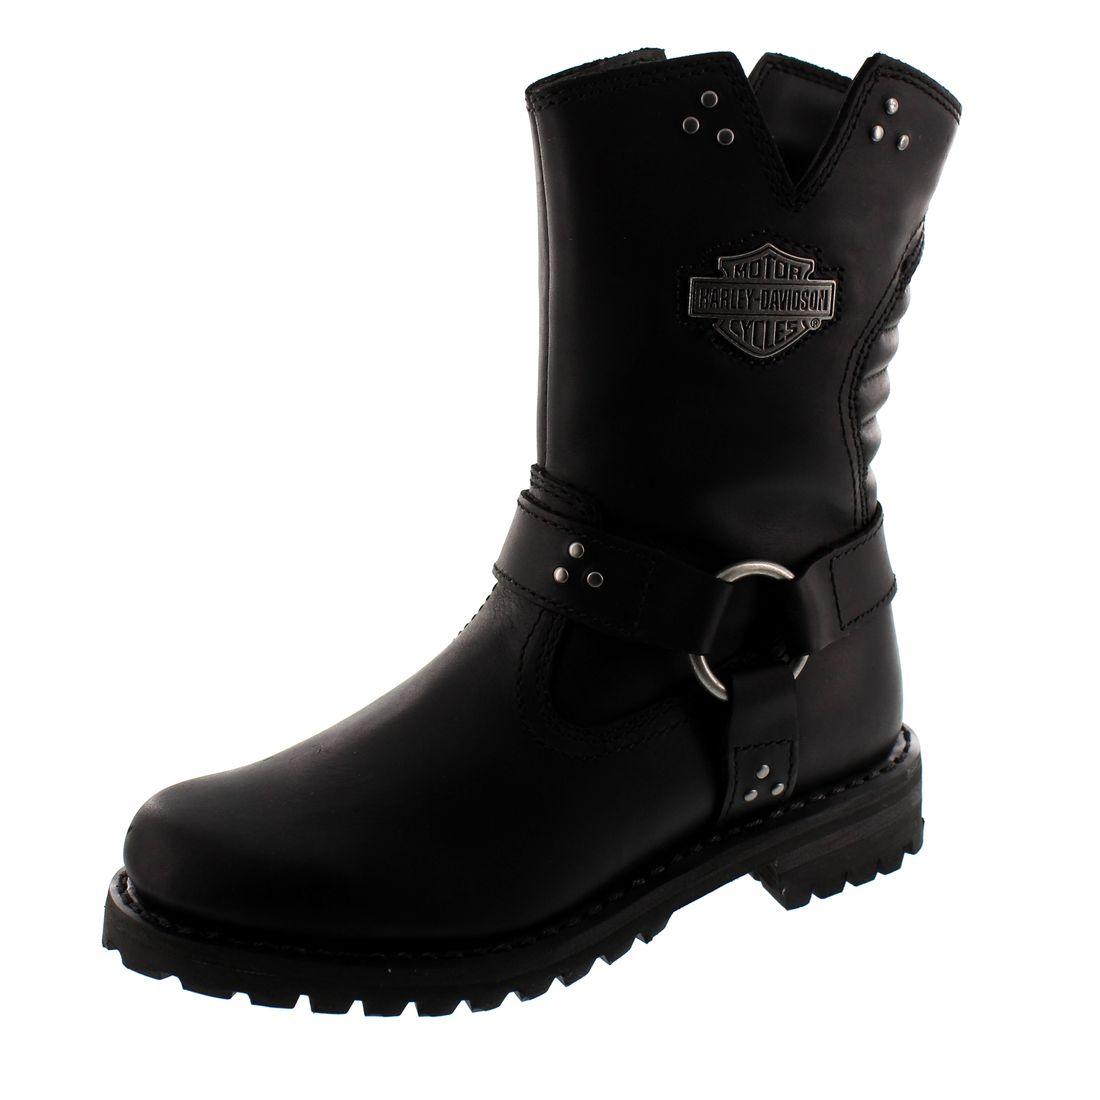 HARLEY DAVIDSON Women - Boots BARFORD D84089 - black